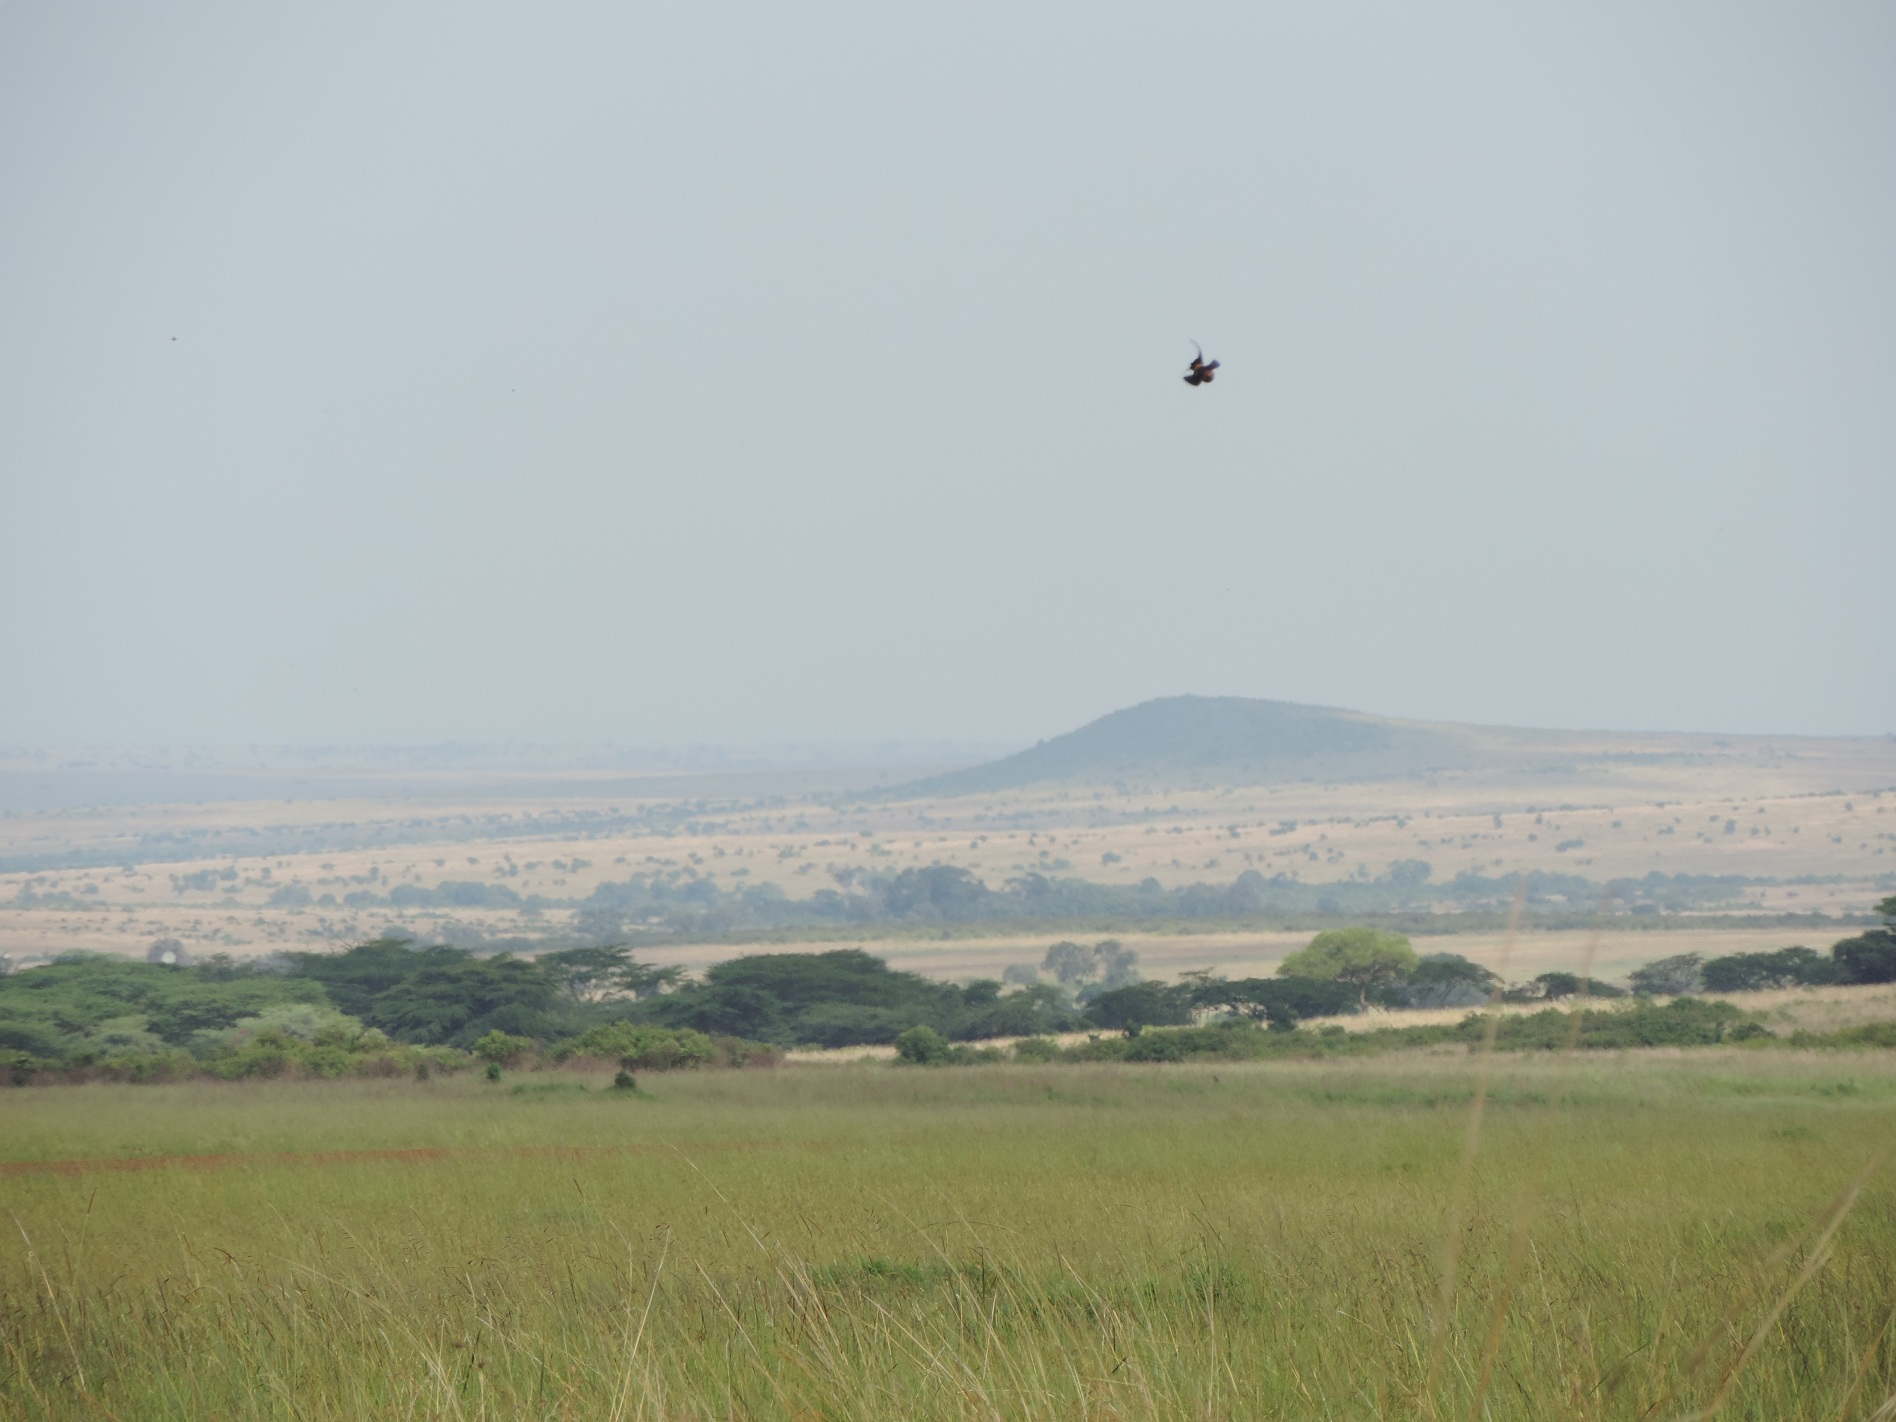 Kenya Tanzania Adventure Budget Camping Safari, YHA Kenya Travel